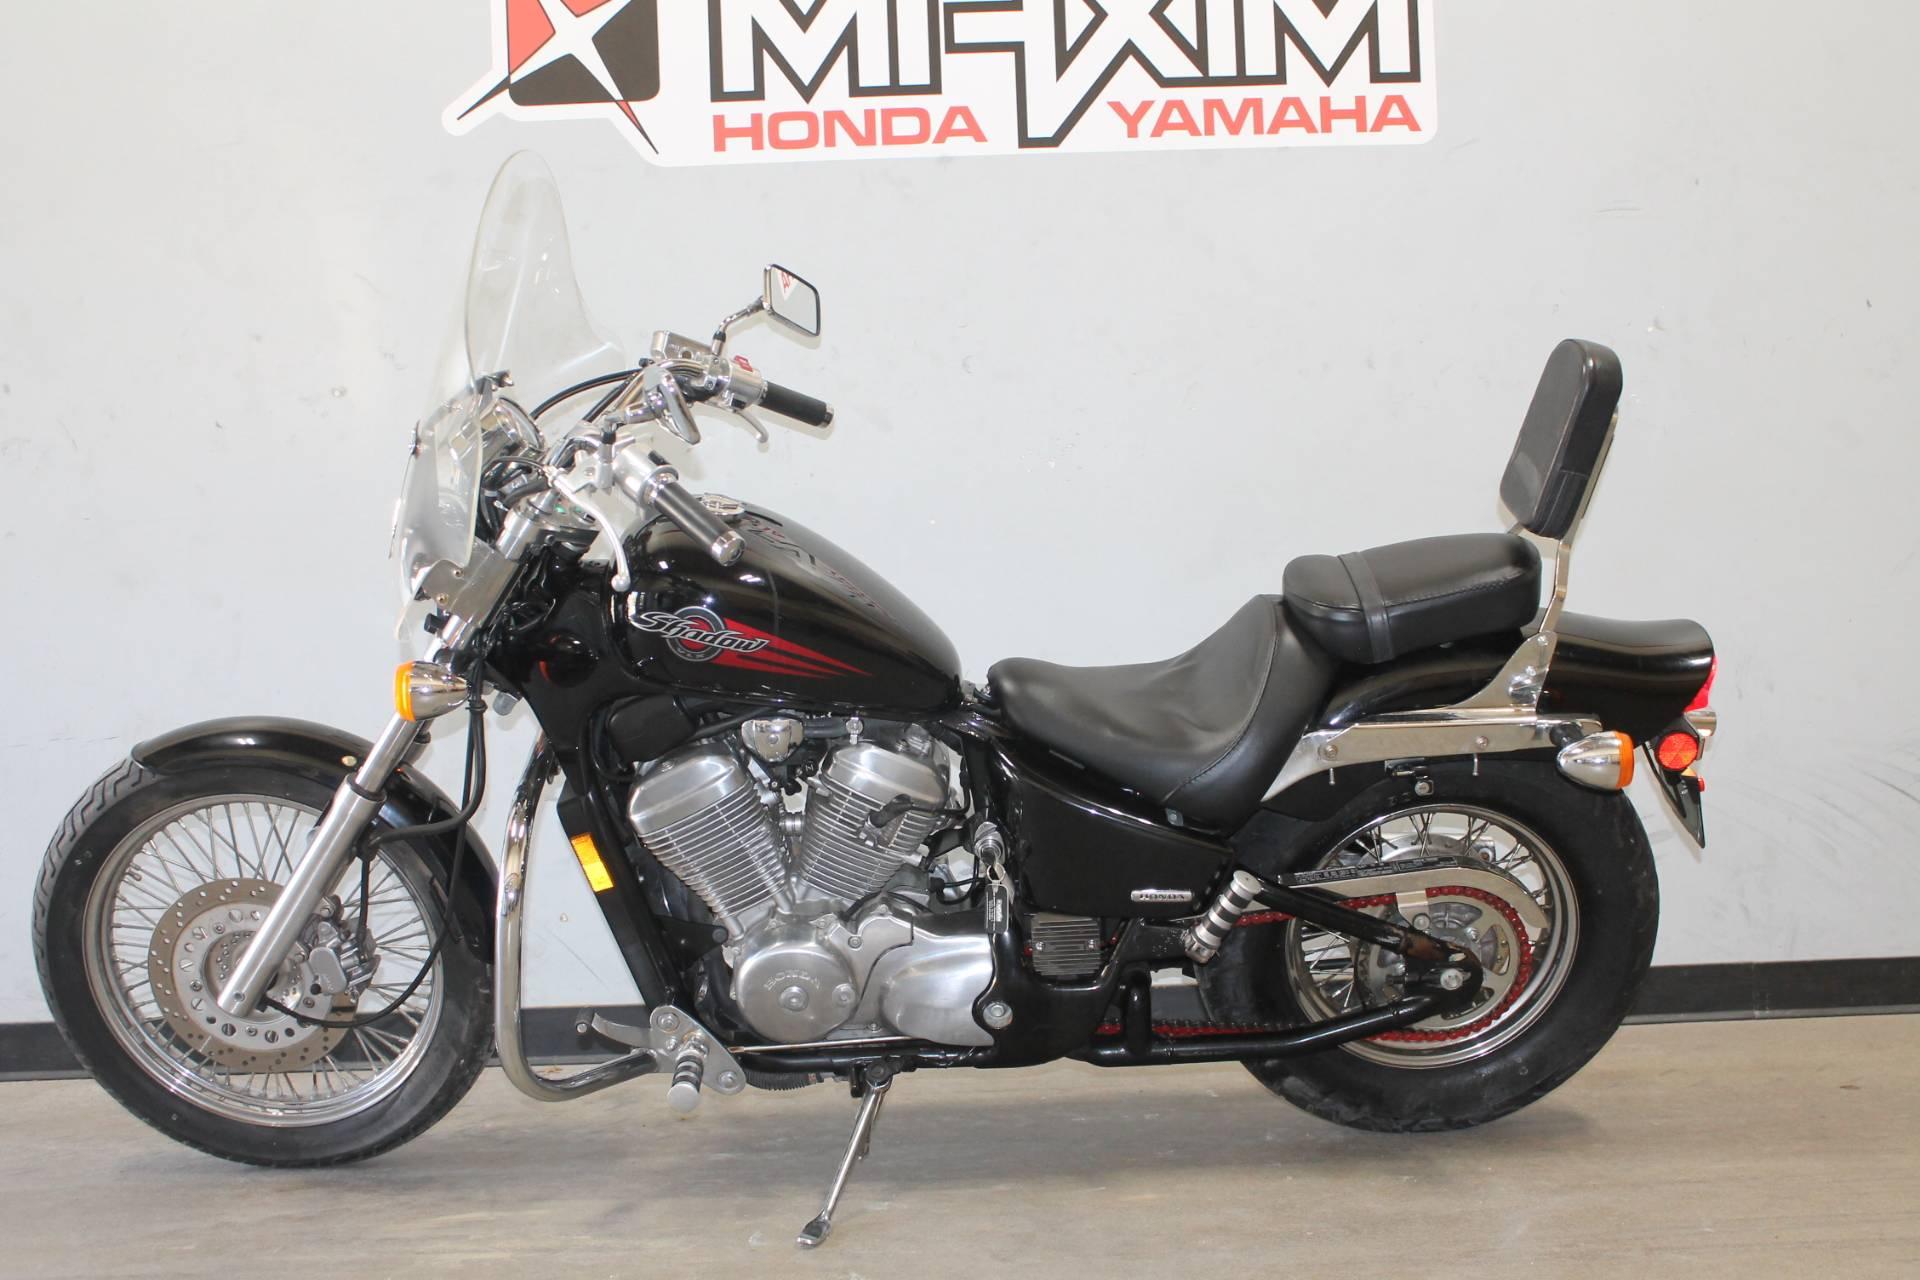 2007 Honda Shadow VT600C for sale 140795